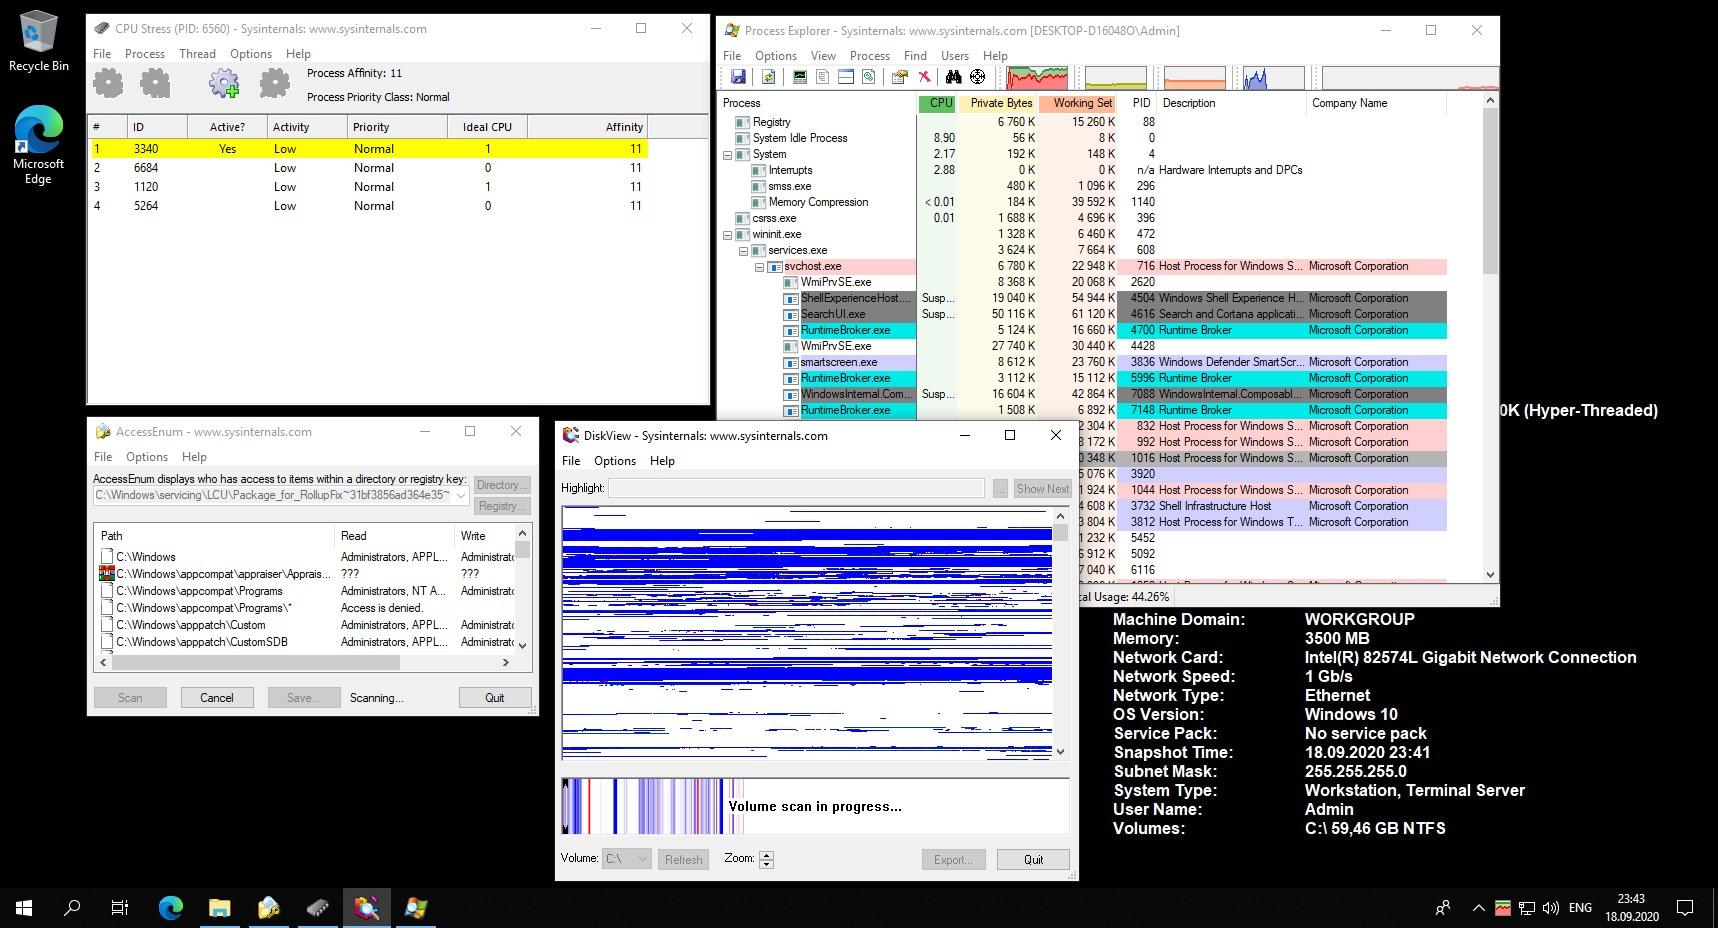 Windows Sysinternals Tools